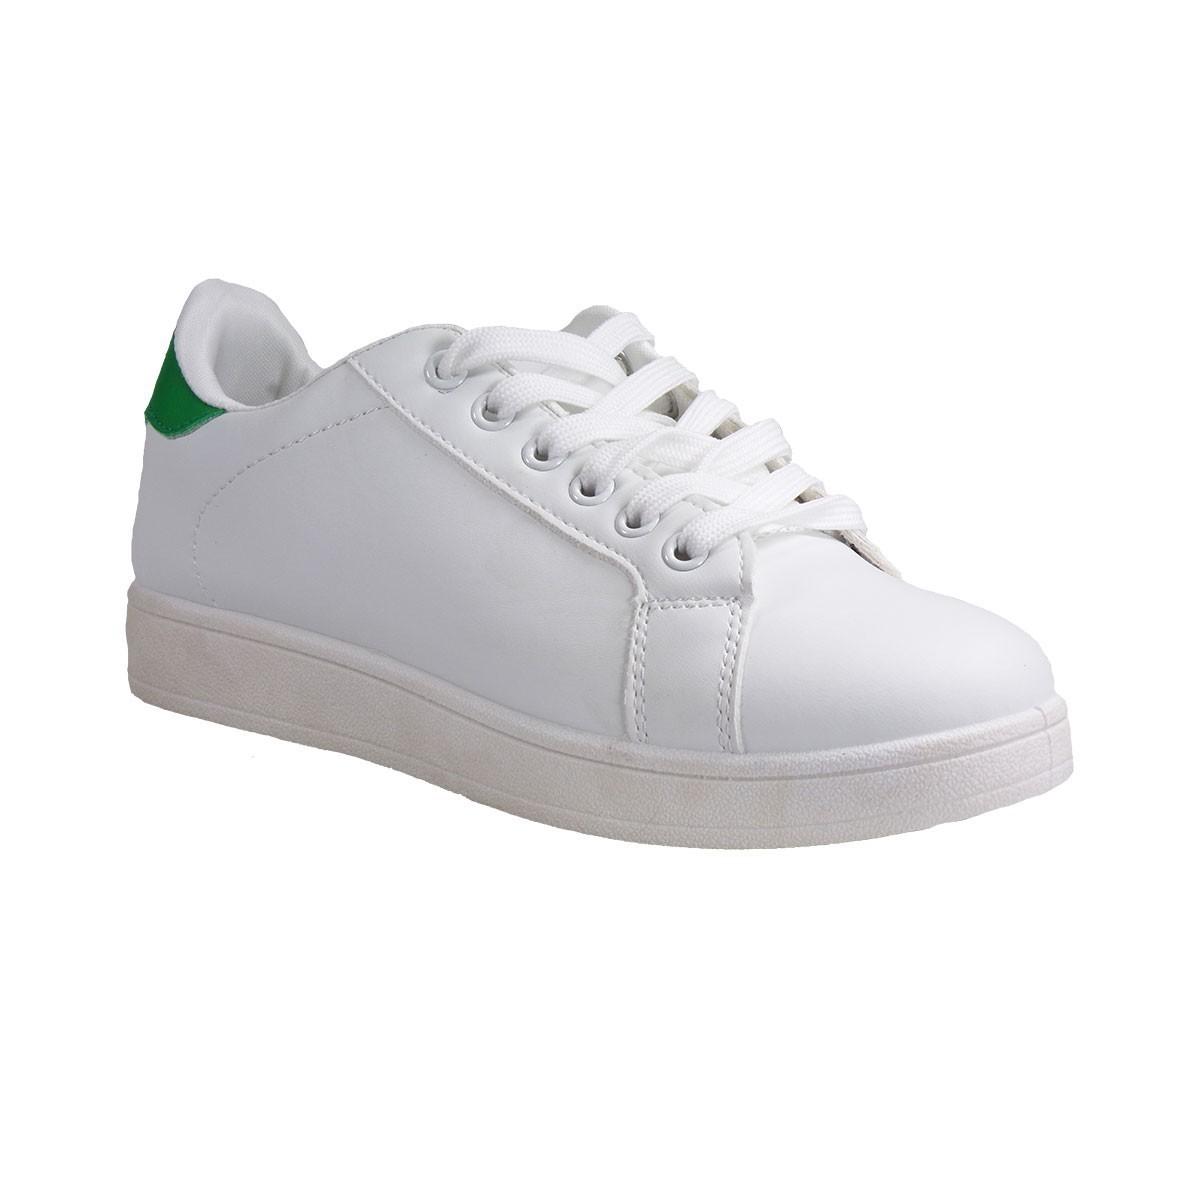 Bagiota Shoes Γυναικεία Παπούτσια Sneakers Αθλητικά 1730 Άσπρο-Πράσινο